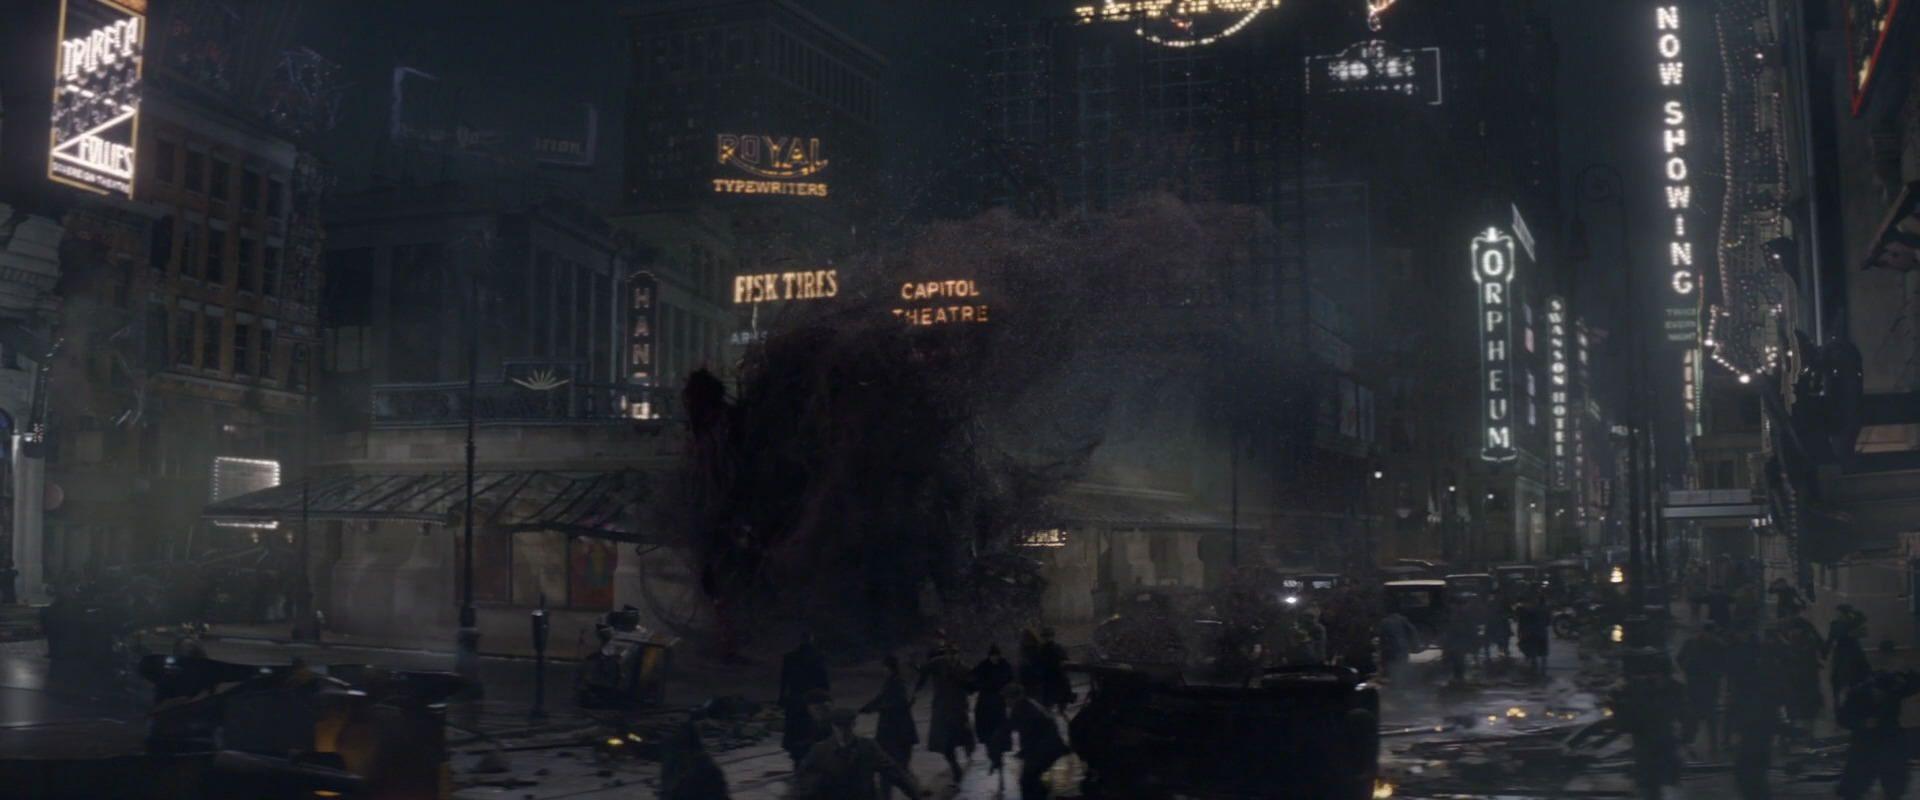 Potterish :: Harry Potter, o Ickabog, Animais Fantásticos e JK Rowling 6 touristic spots from Fantastic Beasts in New York